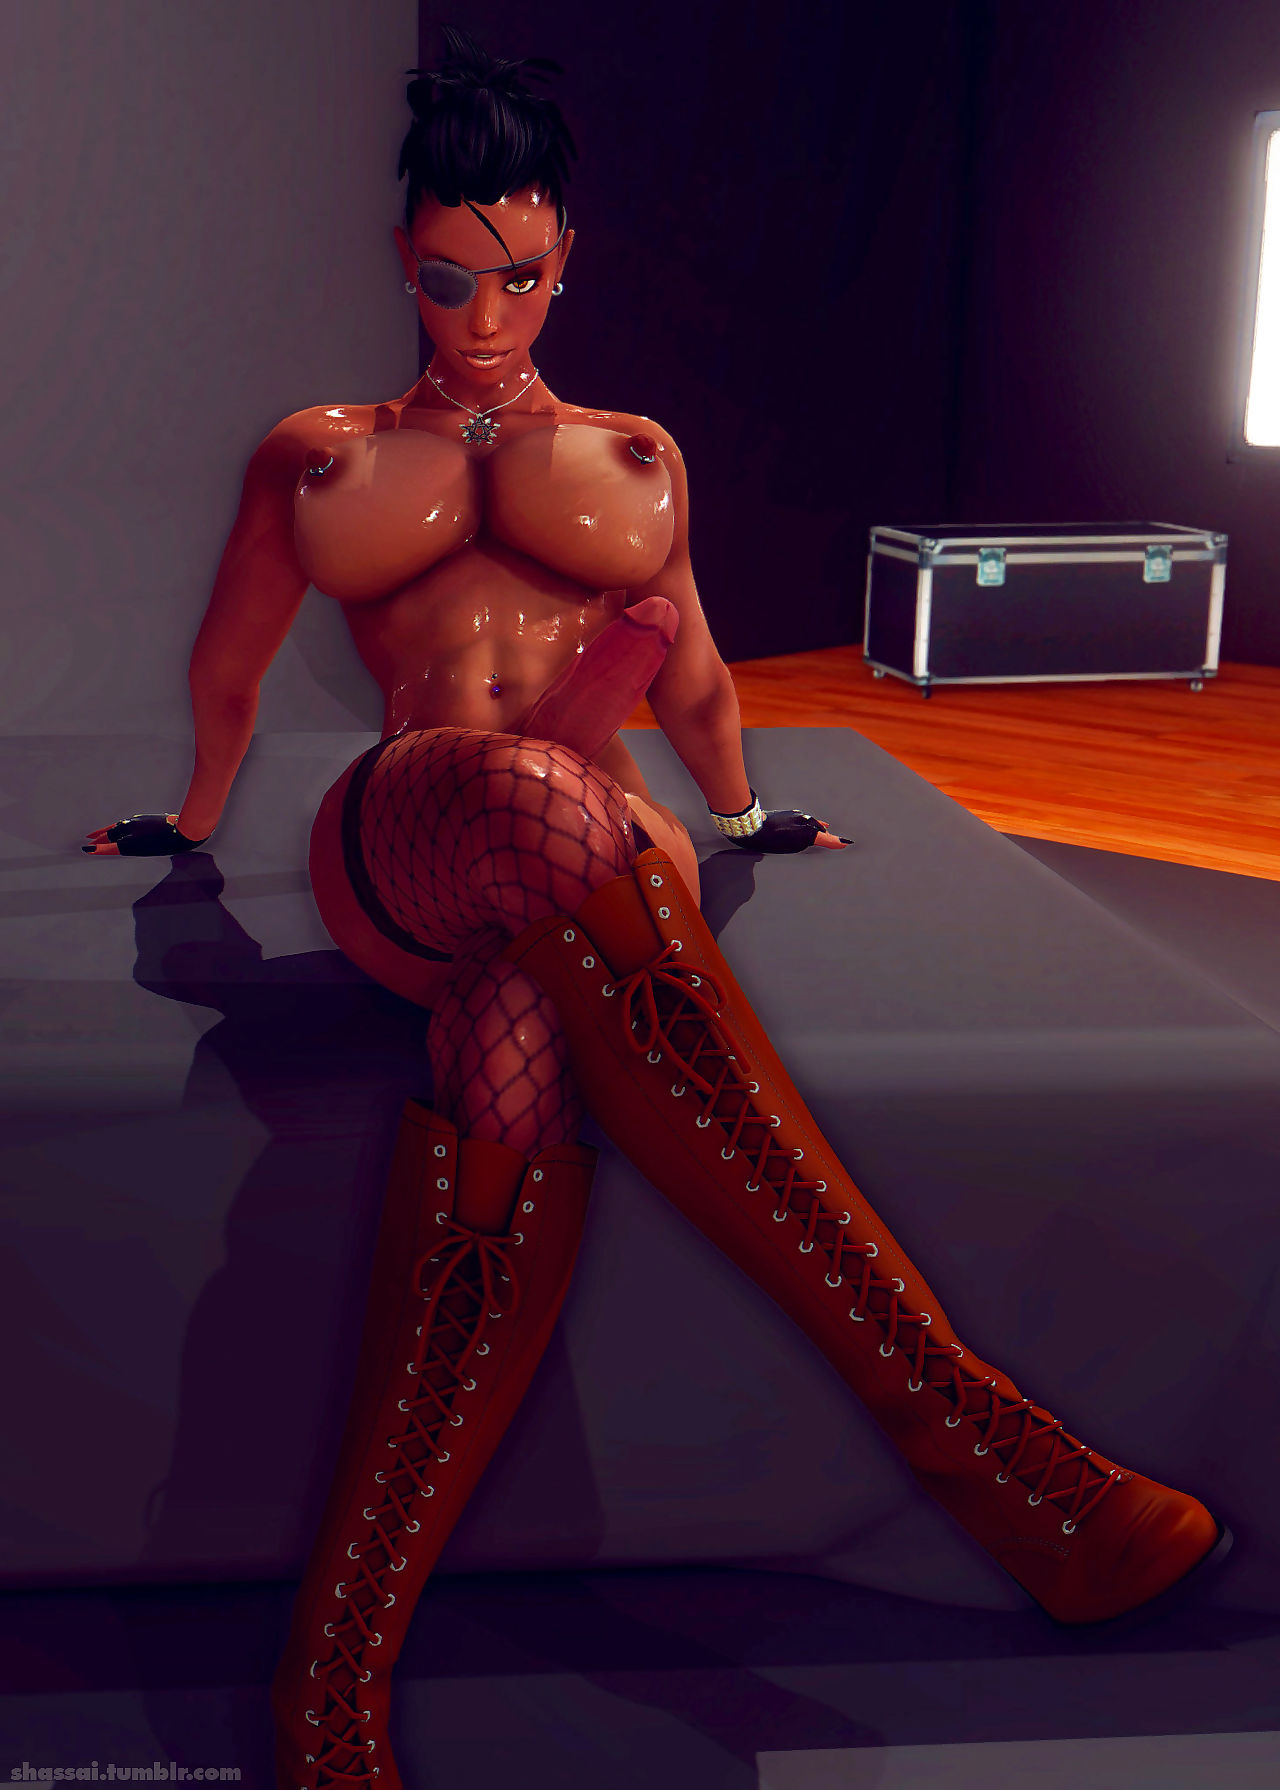 3DX Schemes + animations - decoration 14